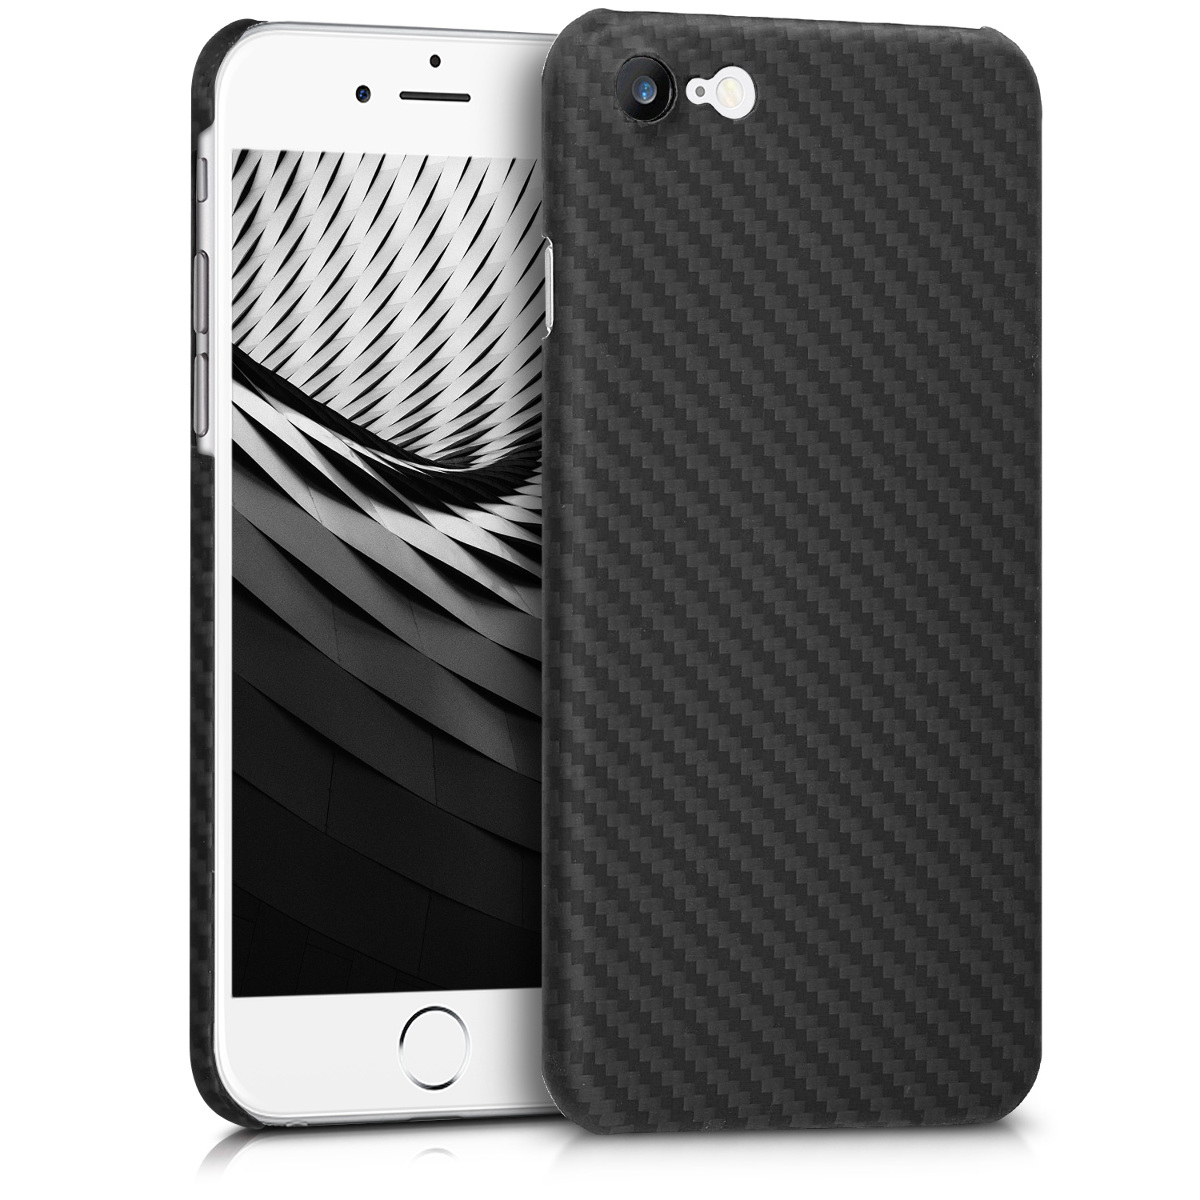 Kalibri Aramid Fiber Body - Σκληρή Θήκη iPhone 8 / 7 - Black Matte (42082.47)